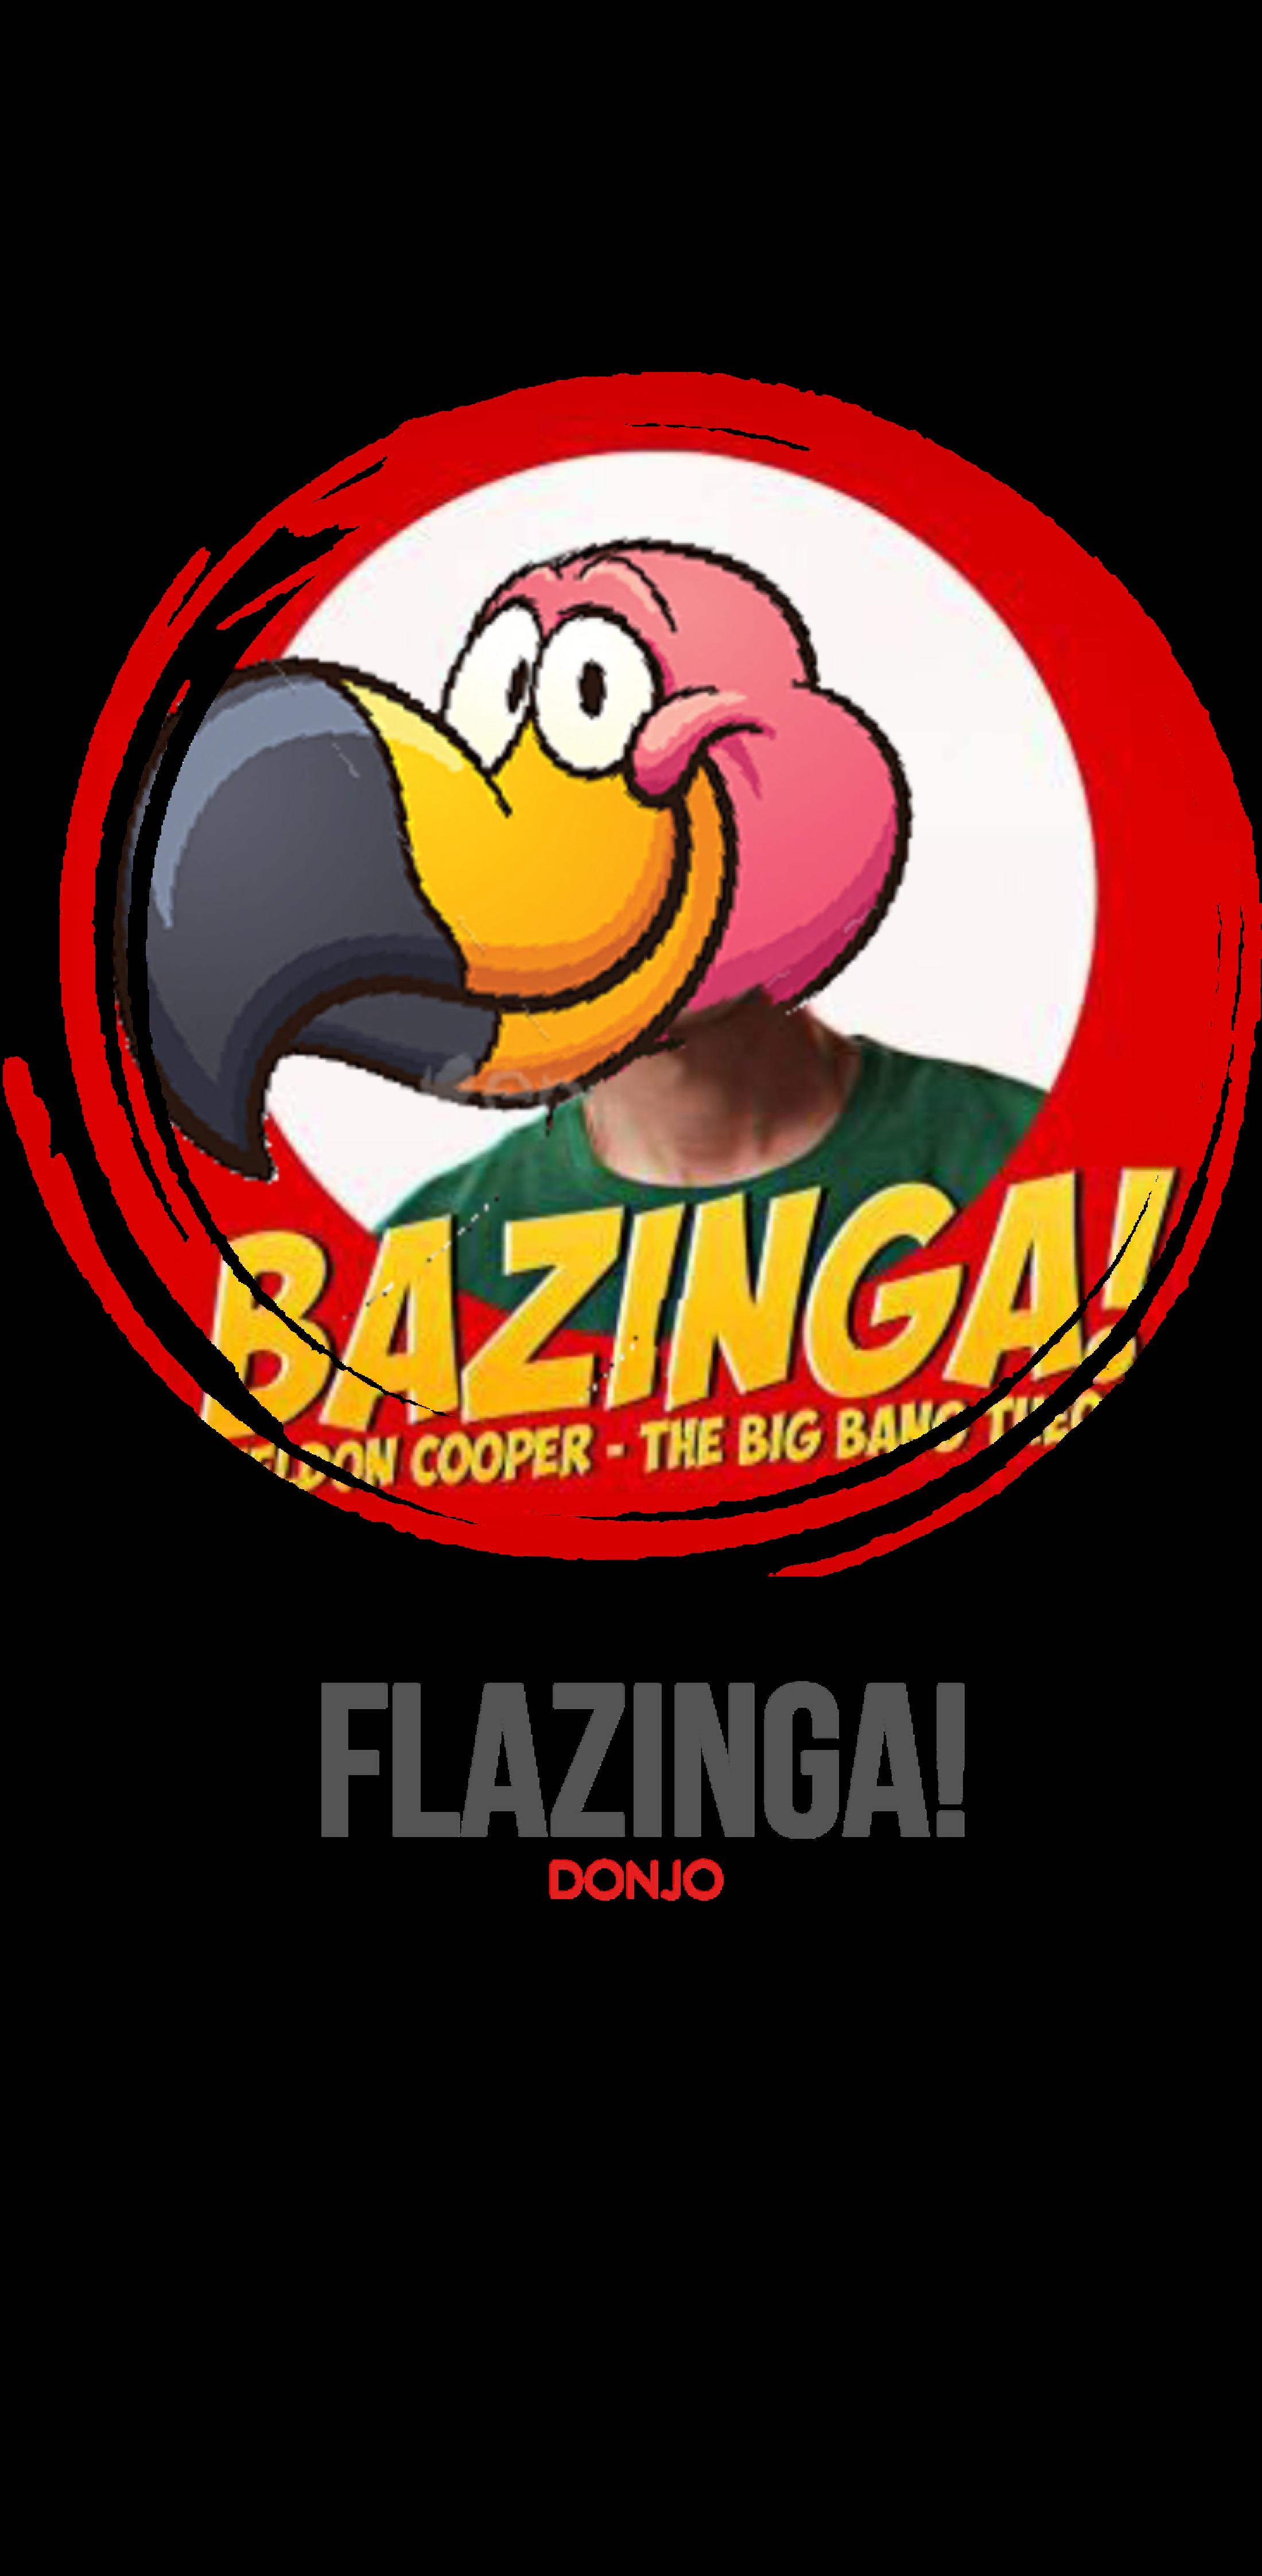 cover Flazinga!